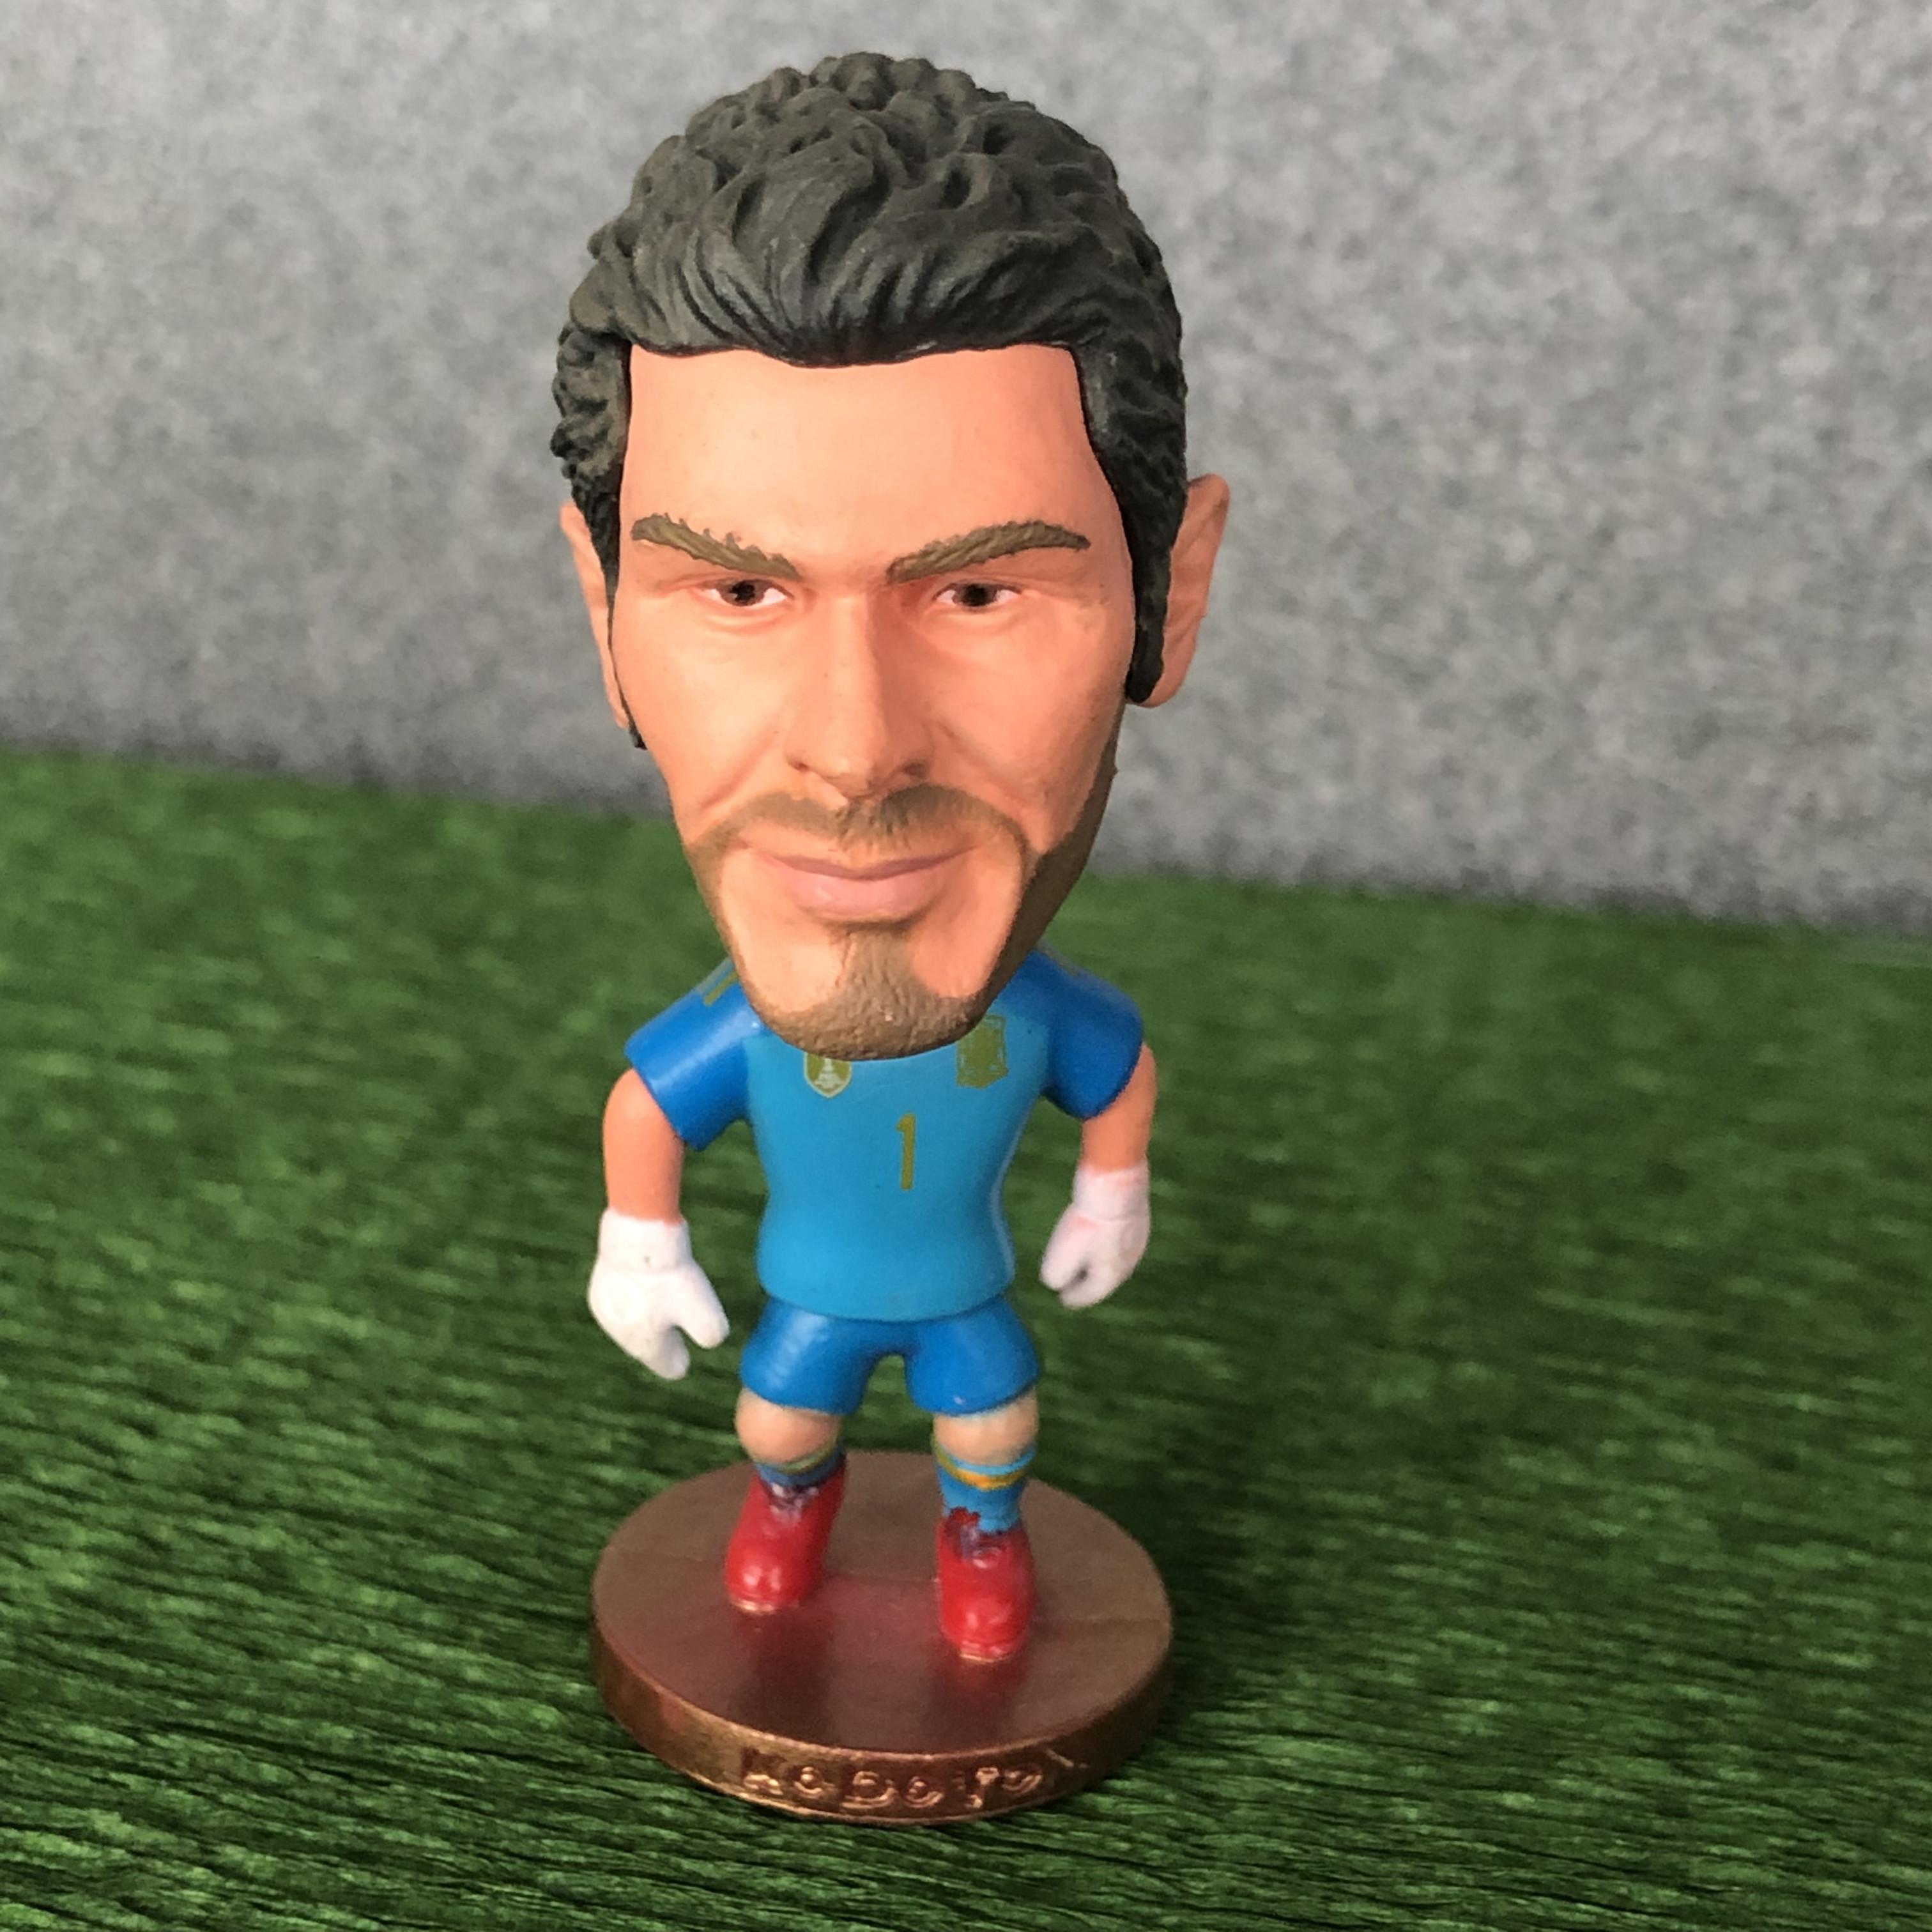 Фигурка звезды мирового футбола икер касильяс